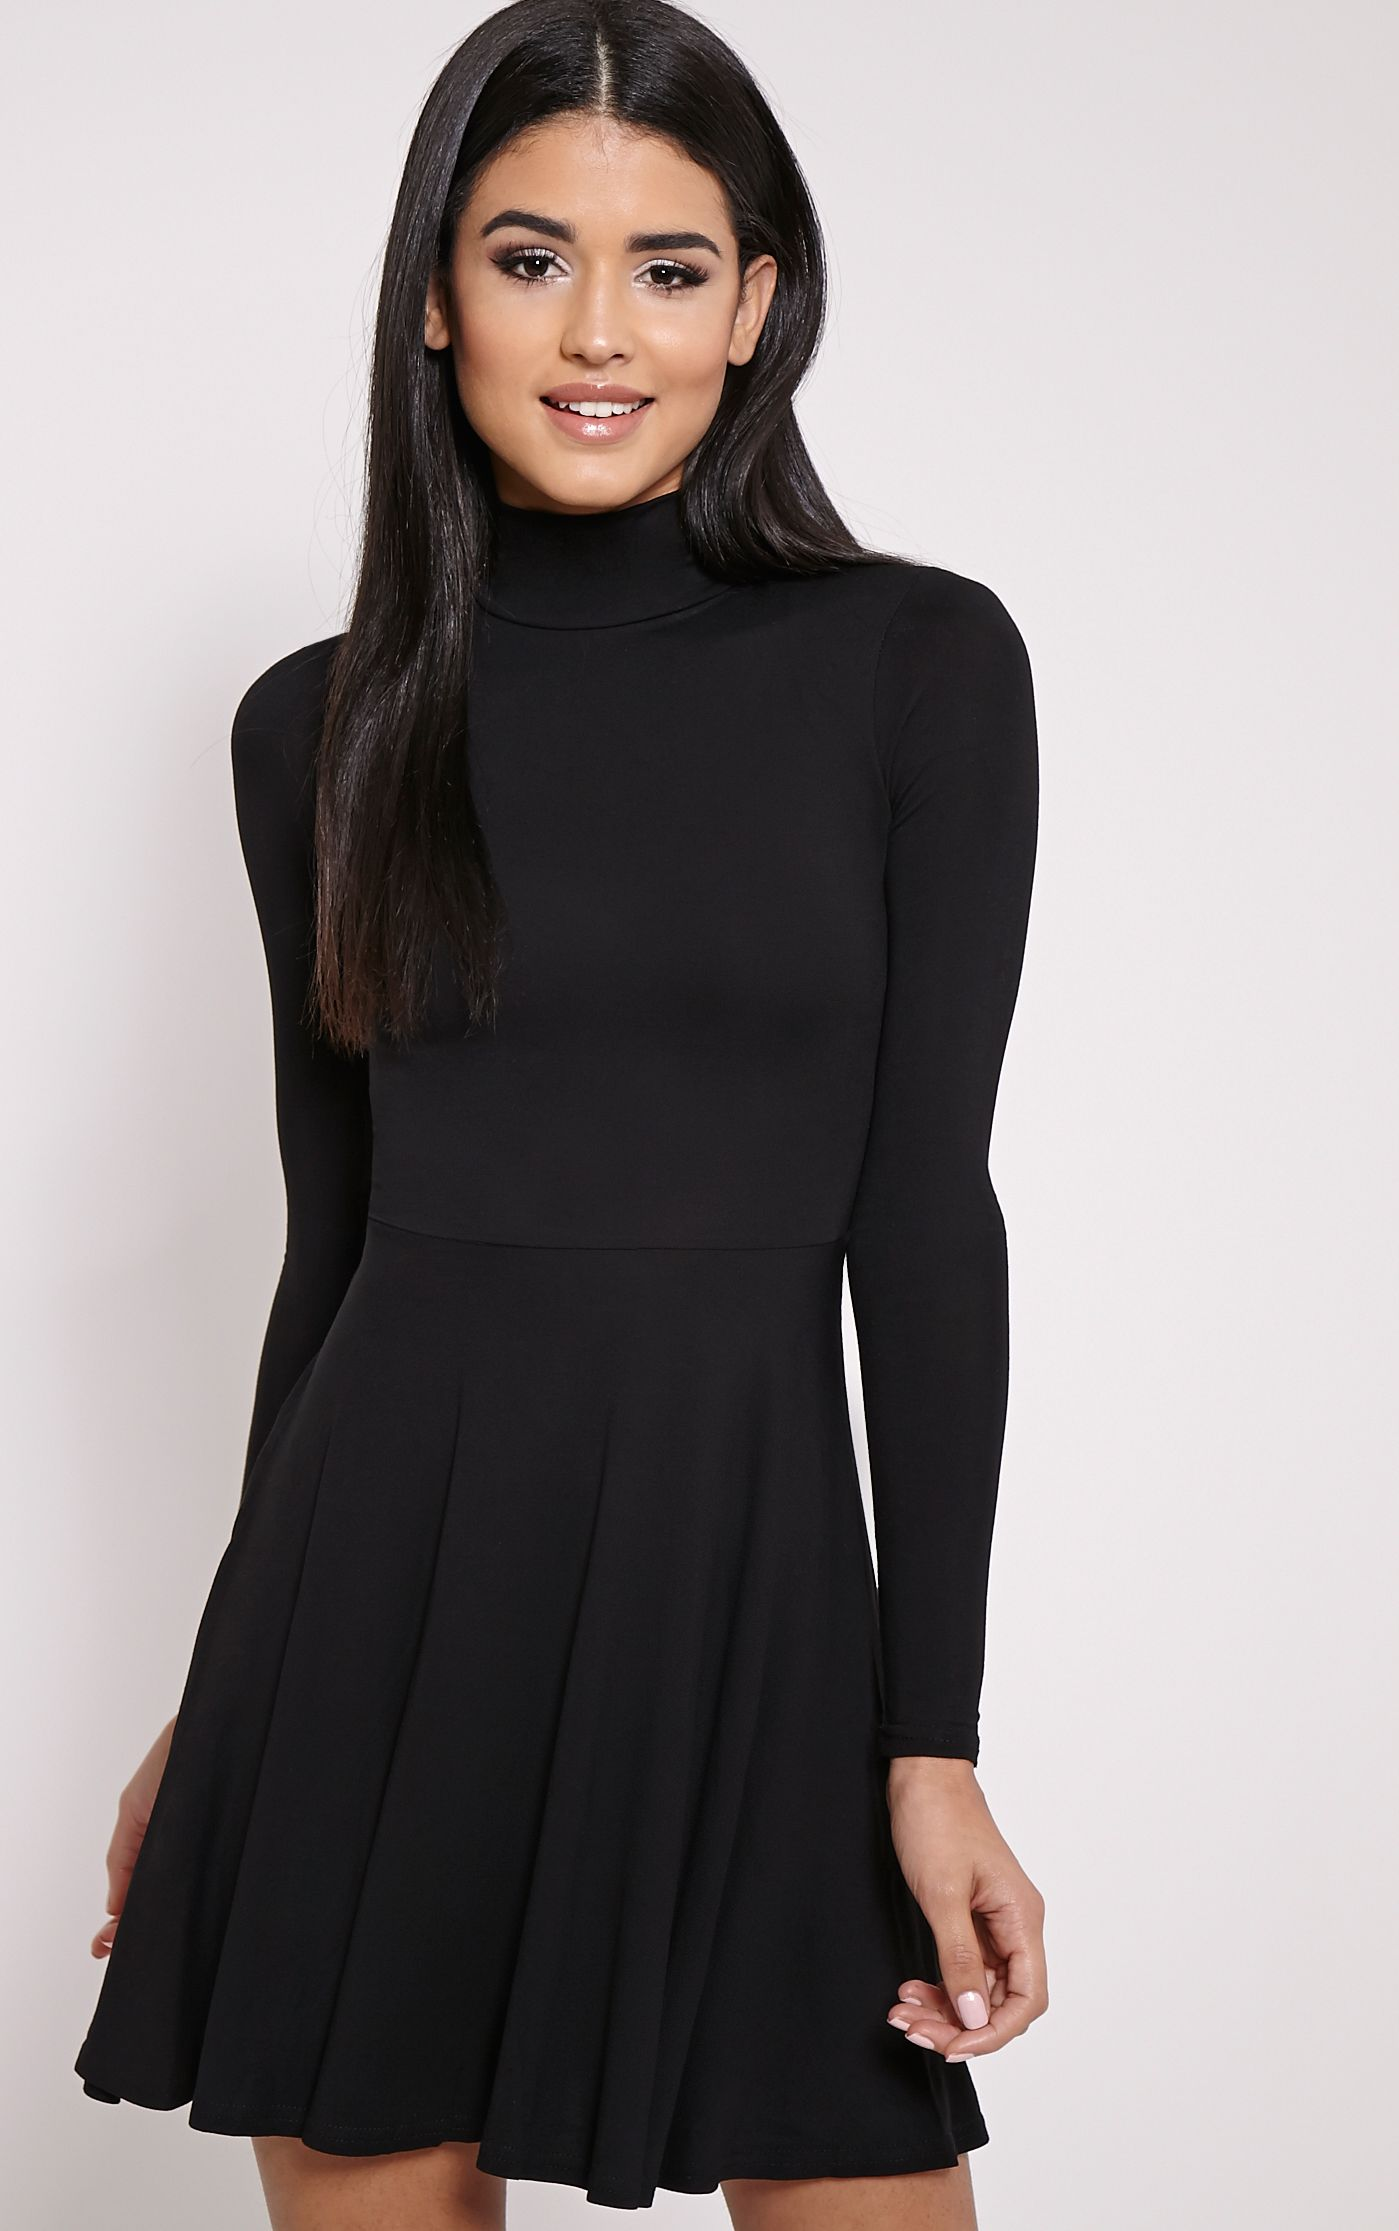 Basic Black High Neck Jersey Skater Dress